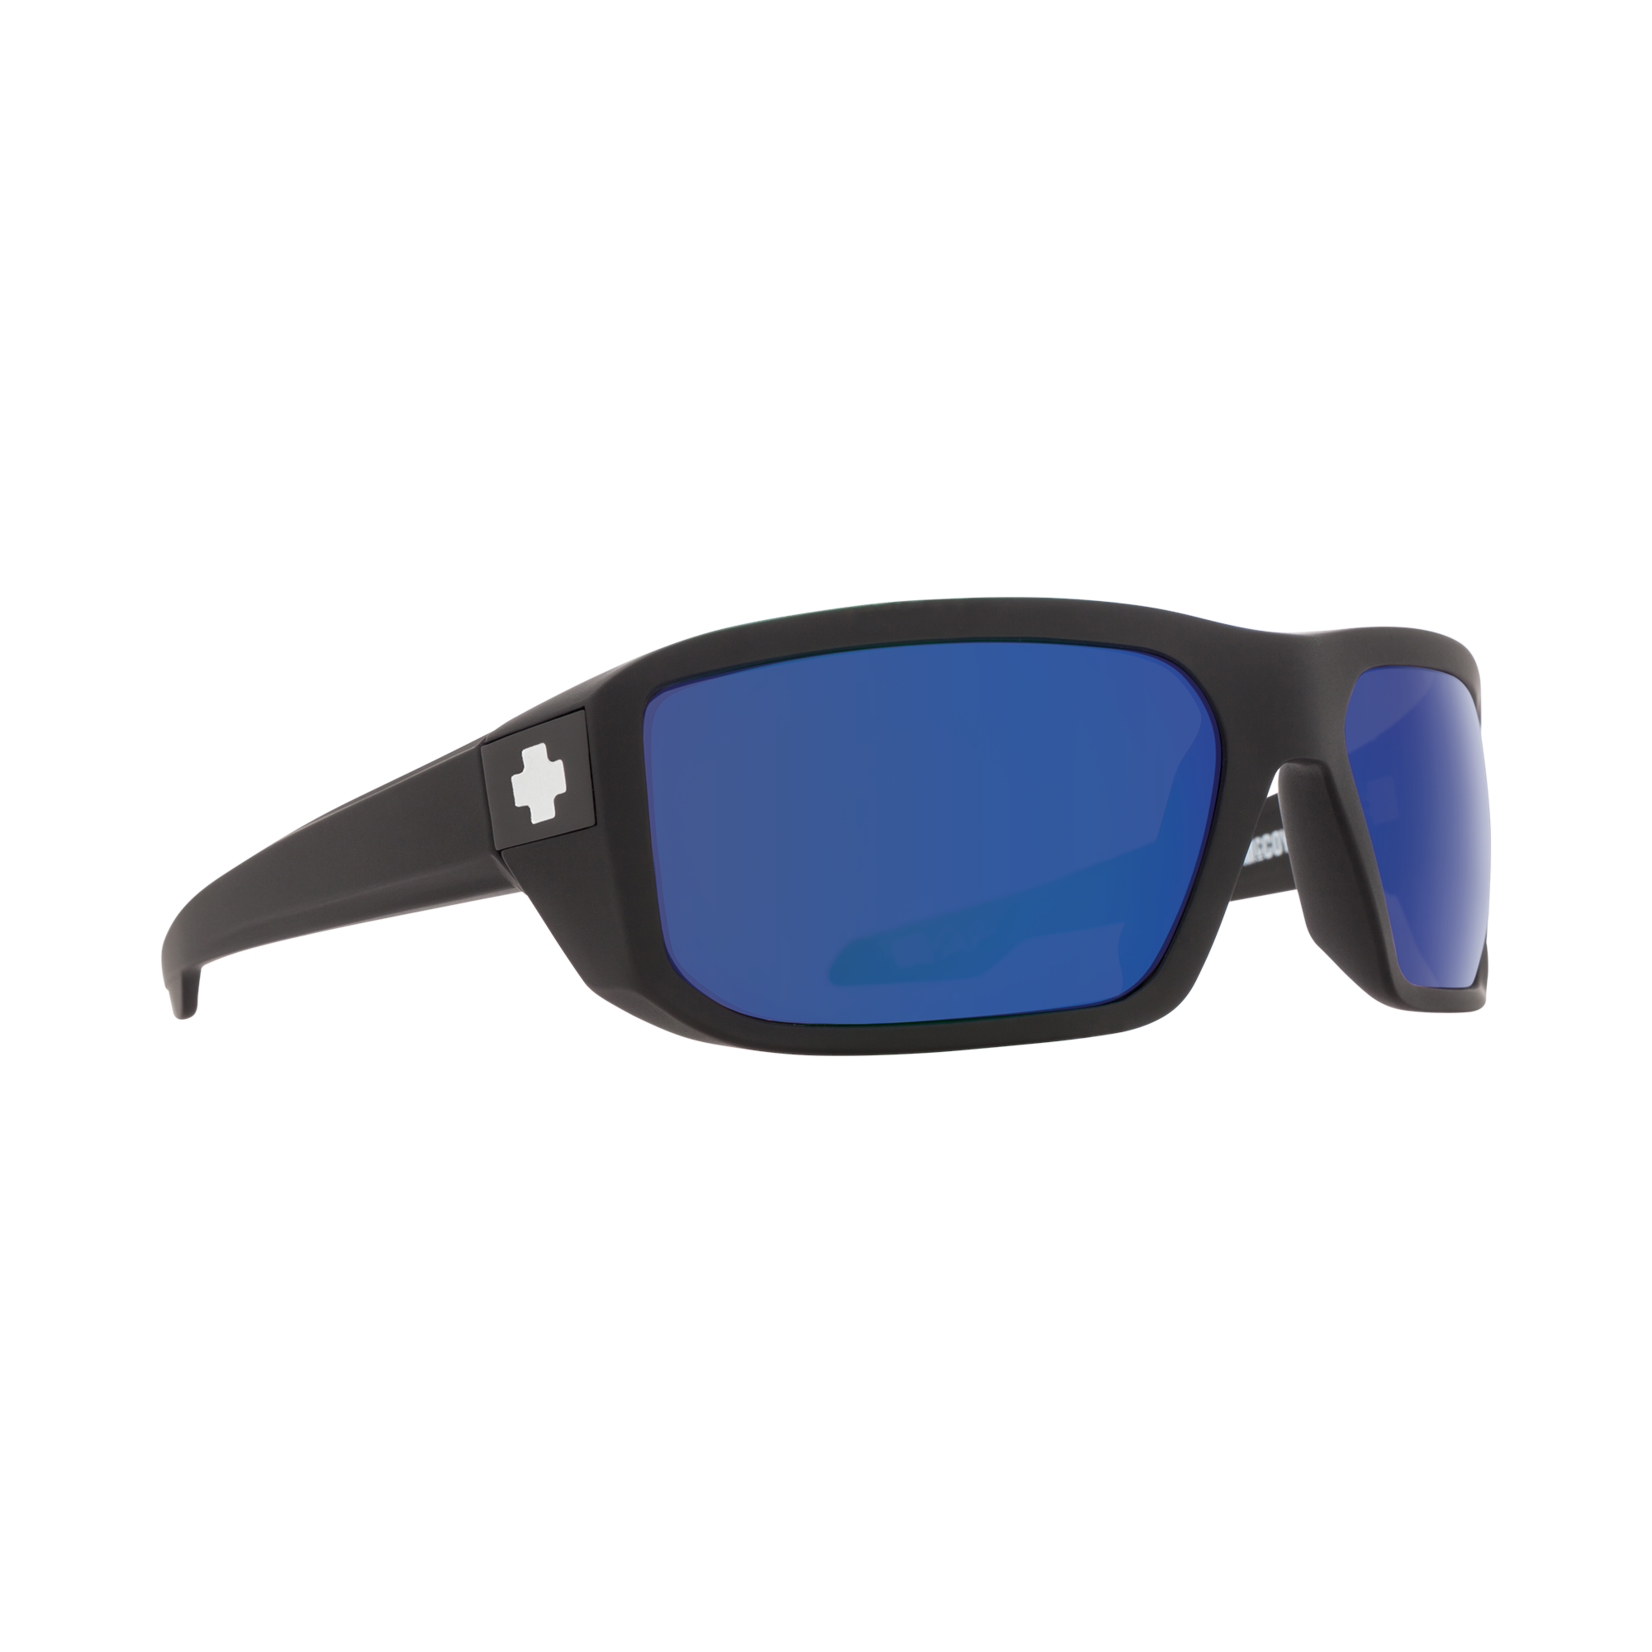 Spy MCCOY MATTE BLACK BRNZ POLAR / BLUE